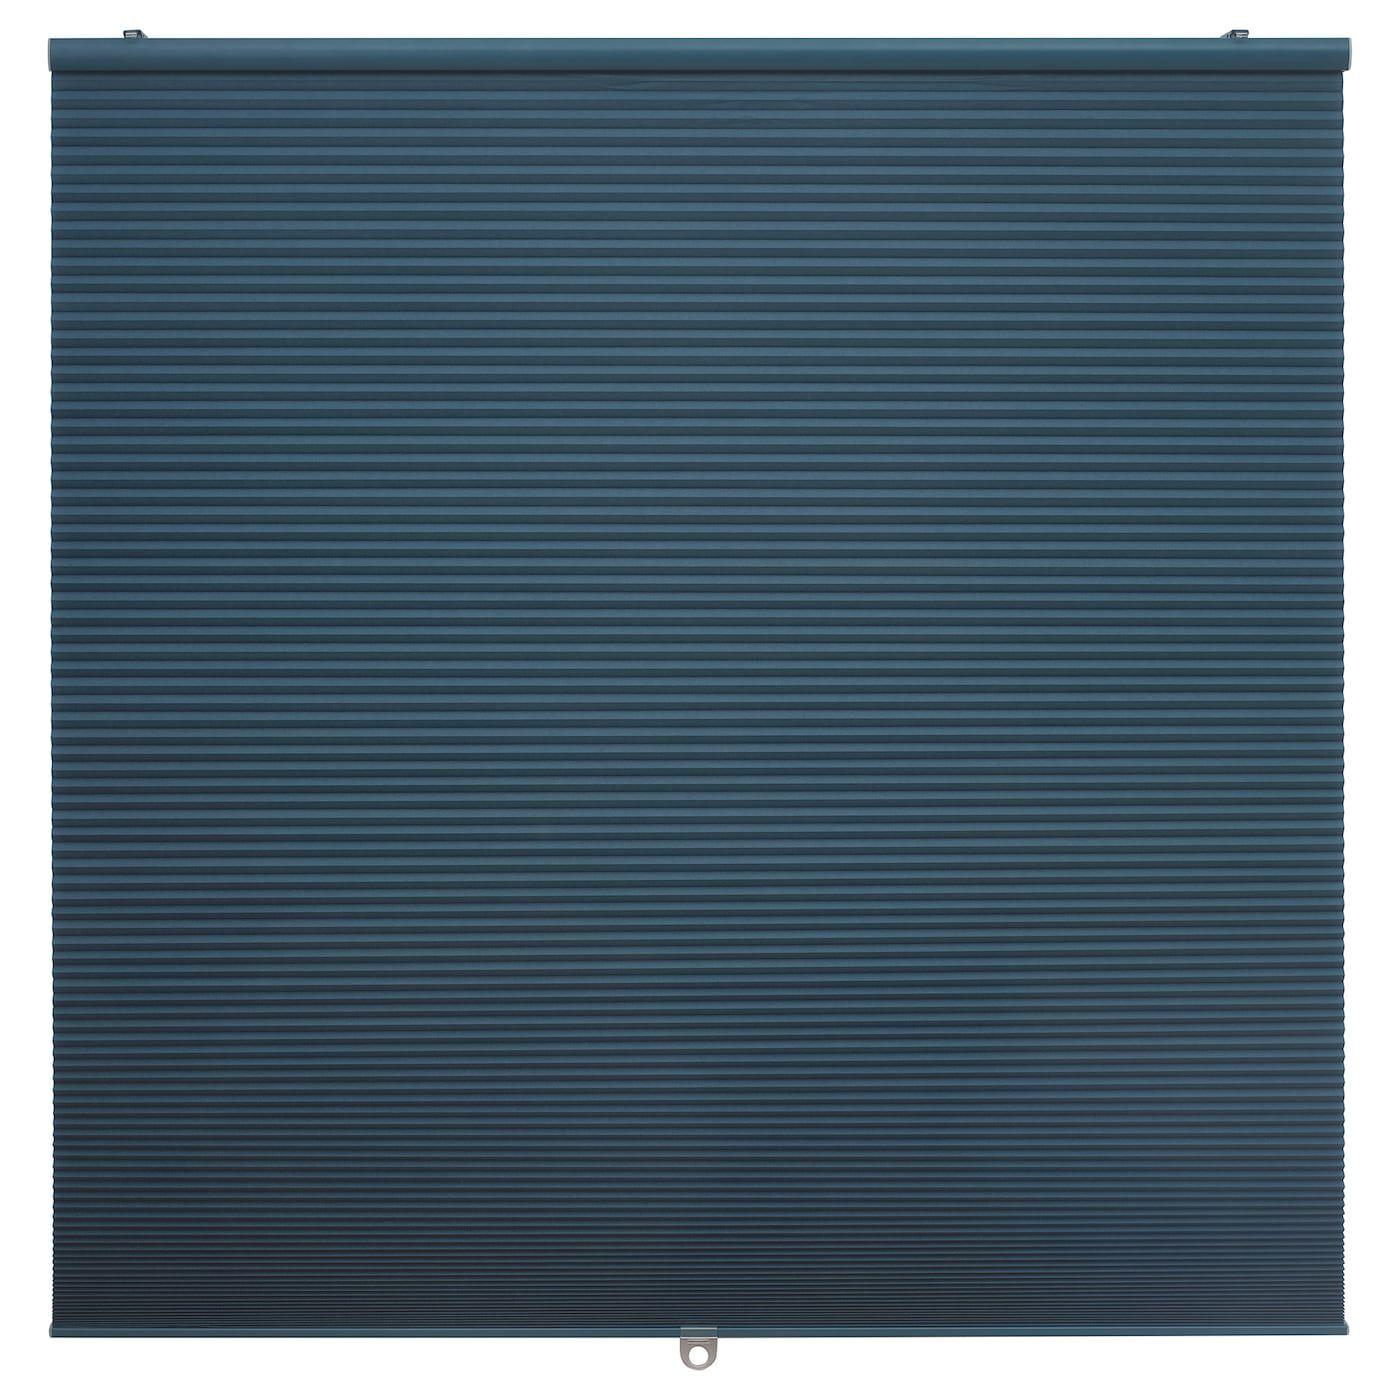 Hoppvals Room Darkening Cellular Blind Blue 32x64 Quot In